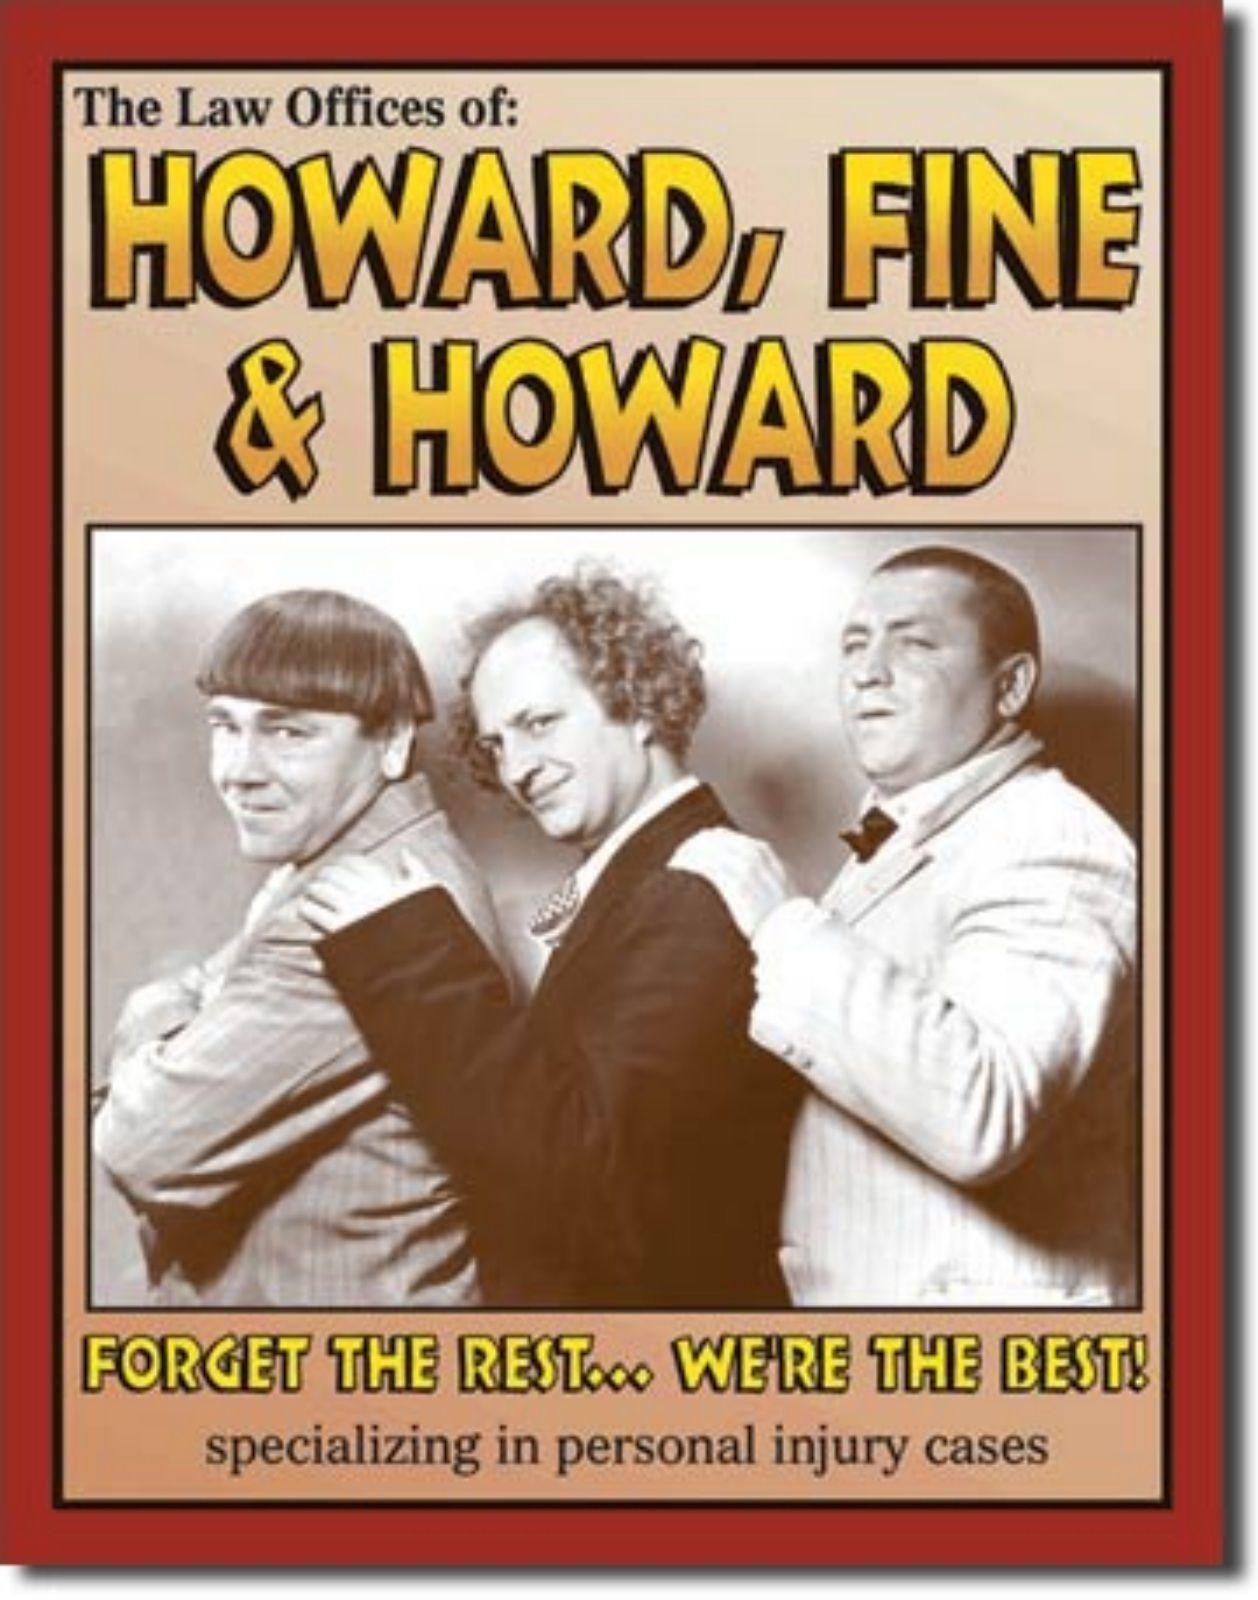 3 Stooges Howard, Fine, & Howard Law Metal Sign Tin New Vintage Style USA #662